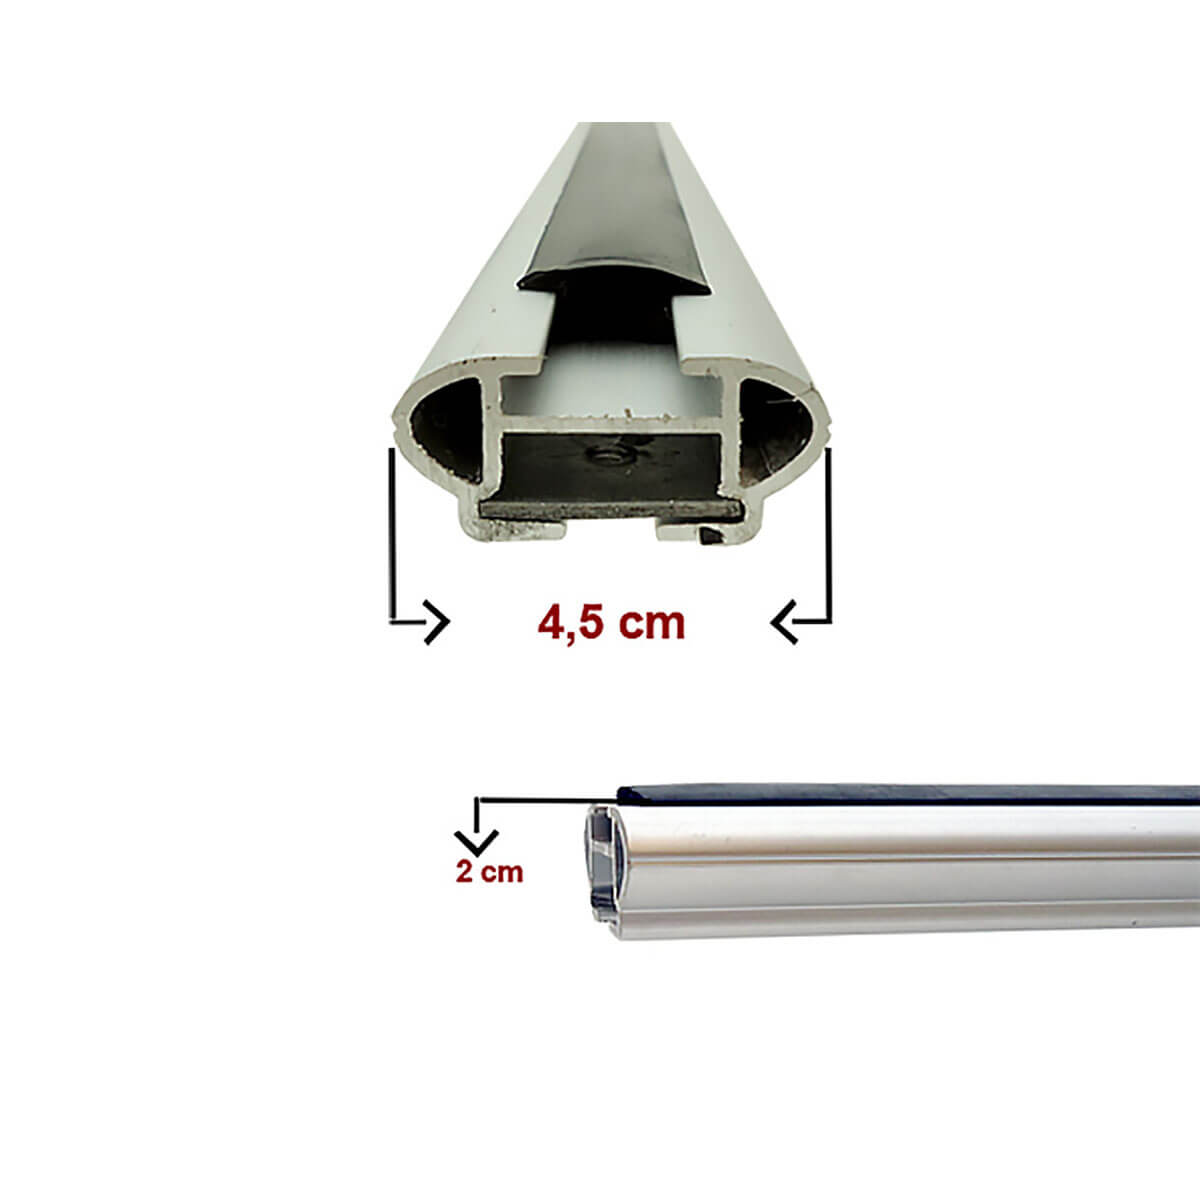 Travessa rack de teto larga alumínio Ecosport 2010 a 2012